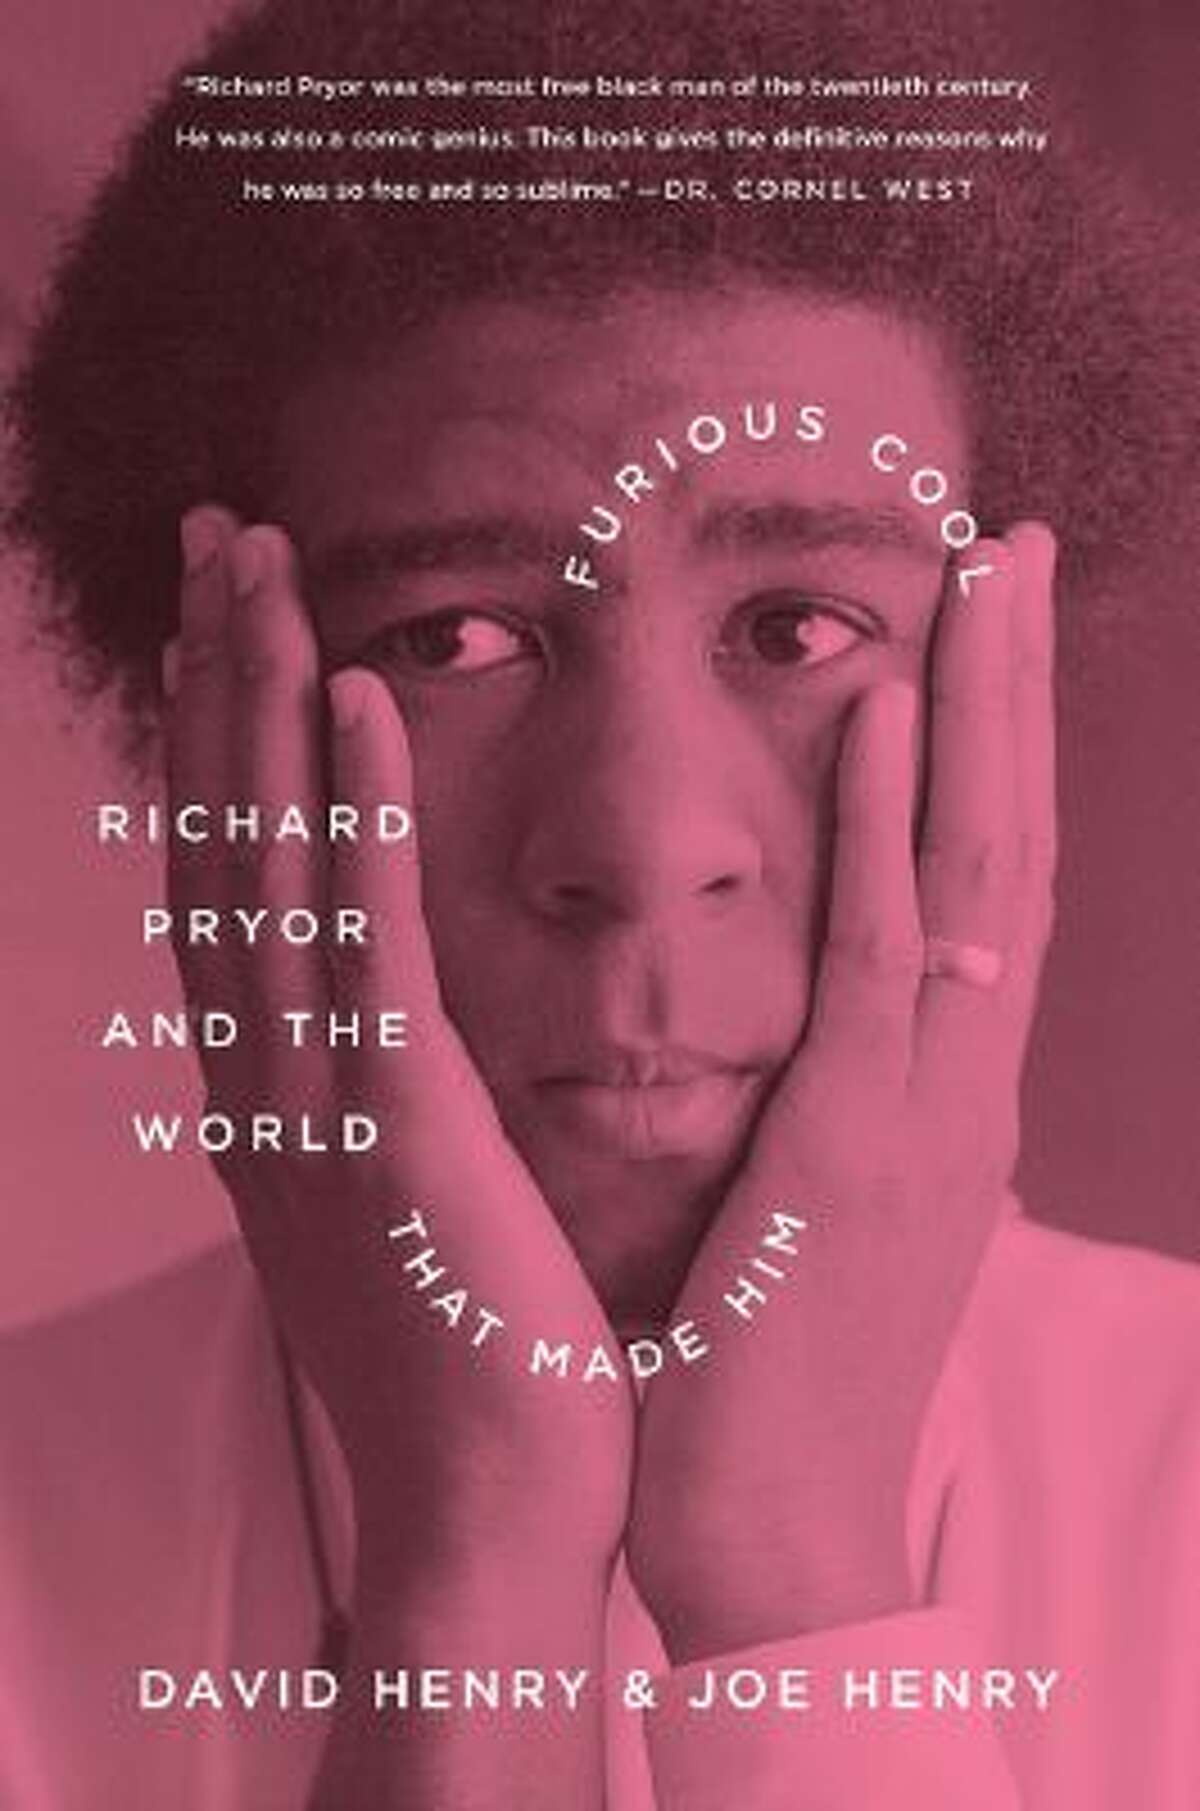 The genius and emptiness of Richard Pryor.